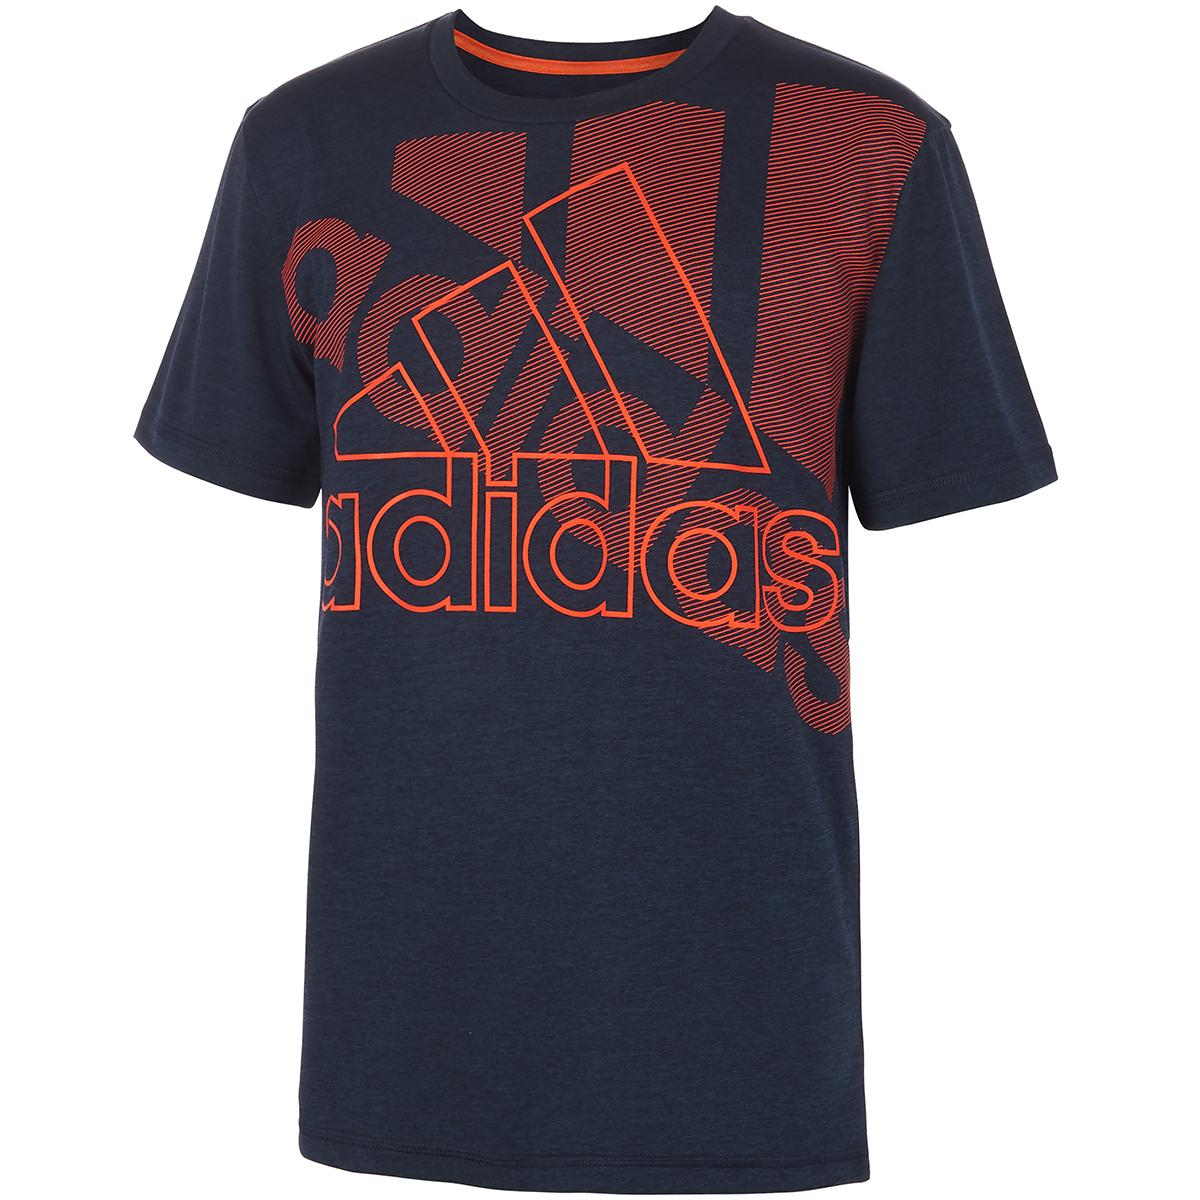 Adidas Little Boys' Short-Sleeve Badge Of Sport Tee - Blue, 7